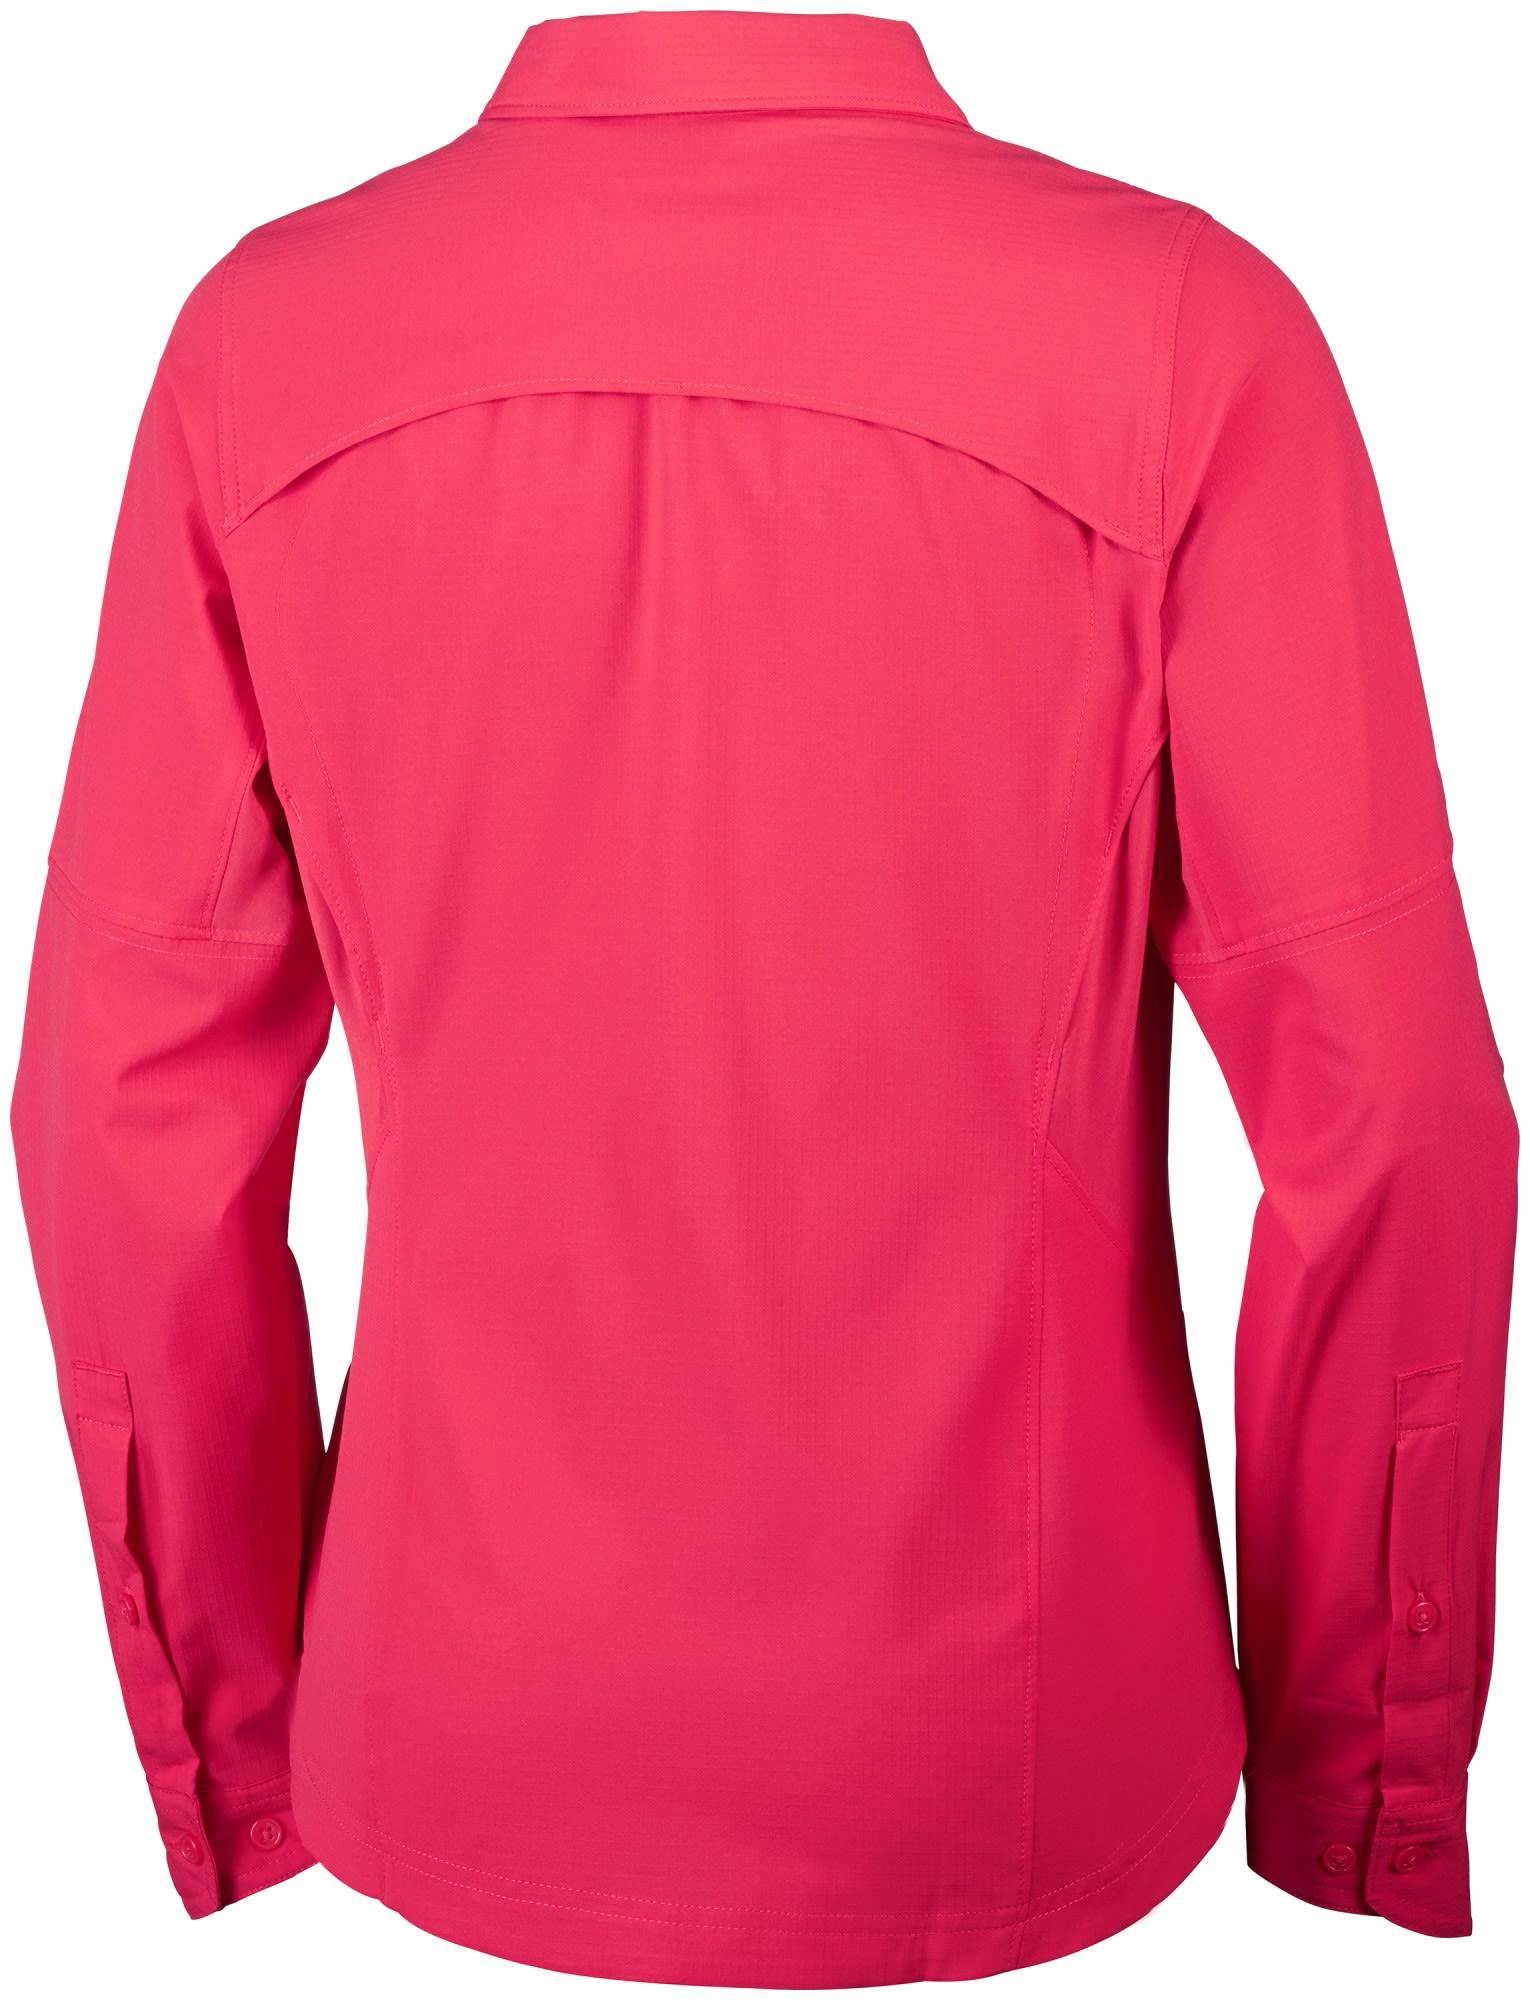 Silver Camelia S Ridge Us Columbia Camisa Rojo Xs L 5xOwqfnS0